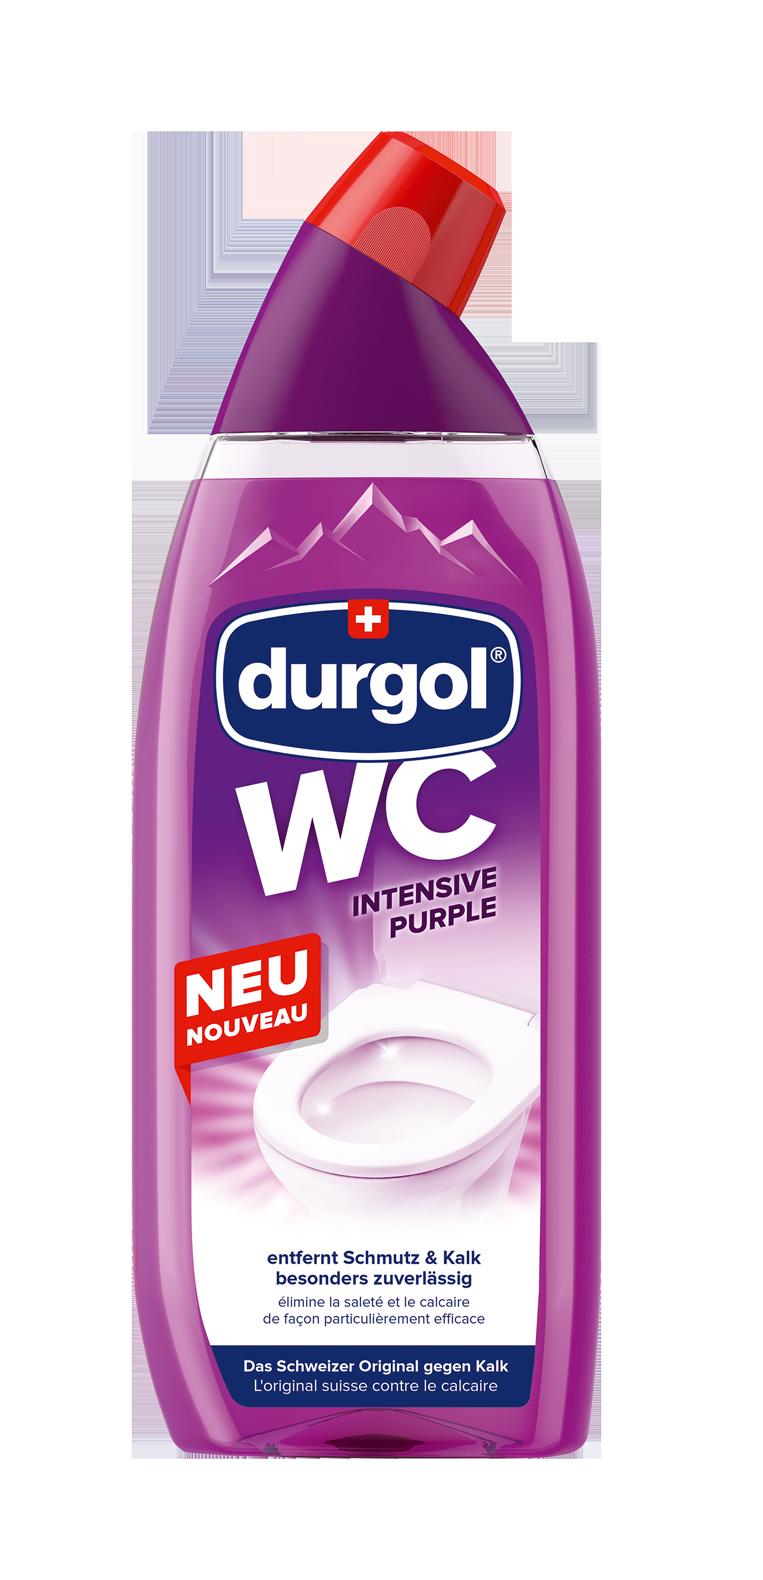 durgol WC intensive purple fles